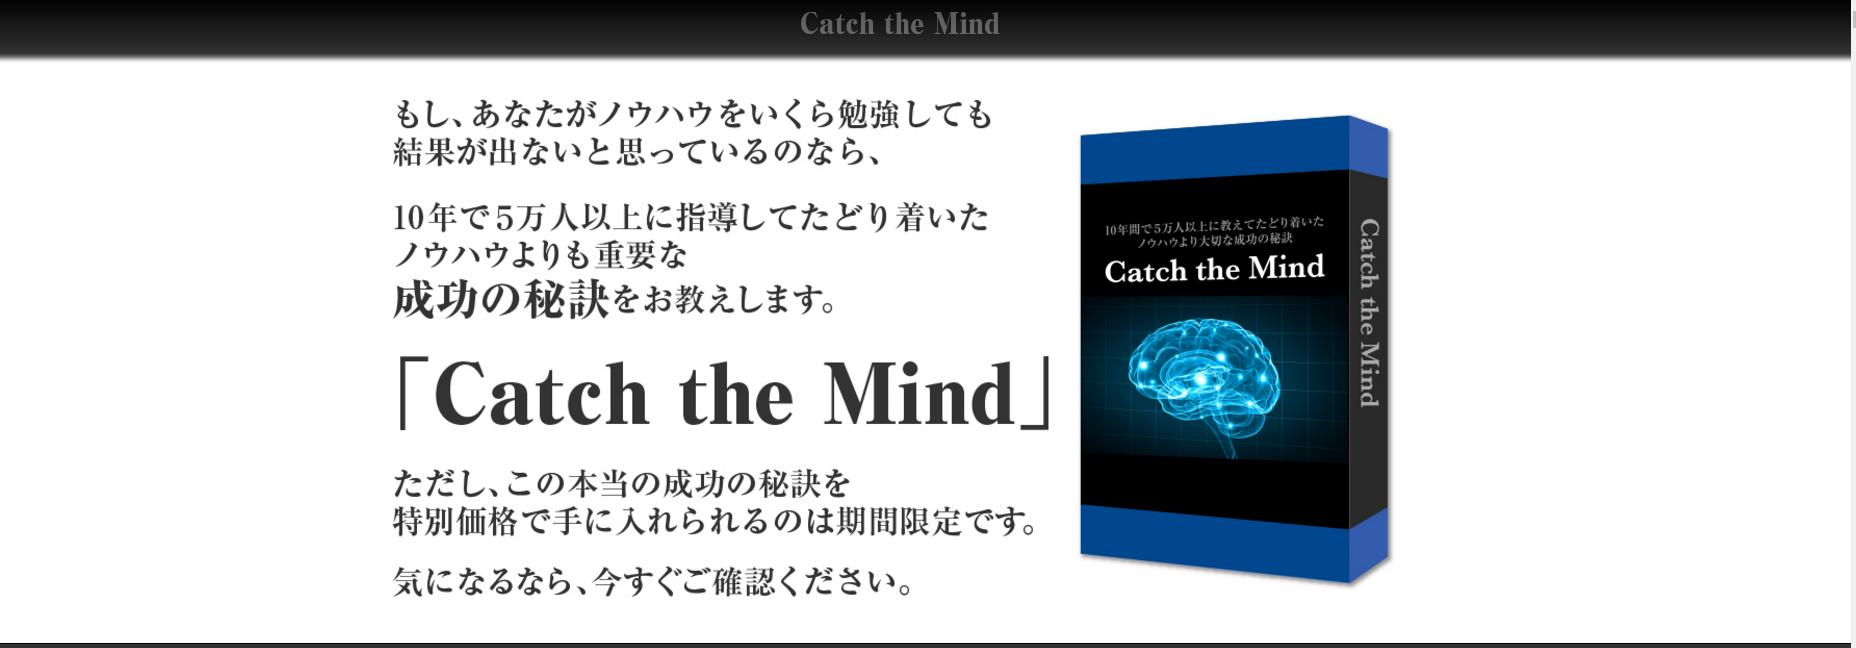 catchthemind-gazou